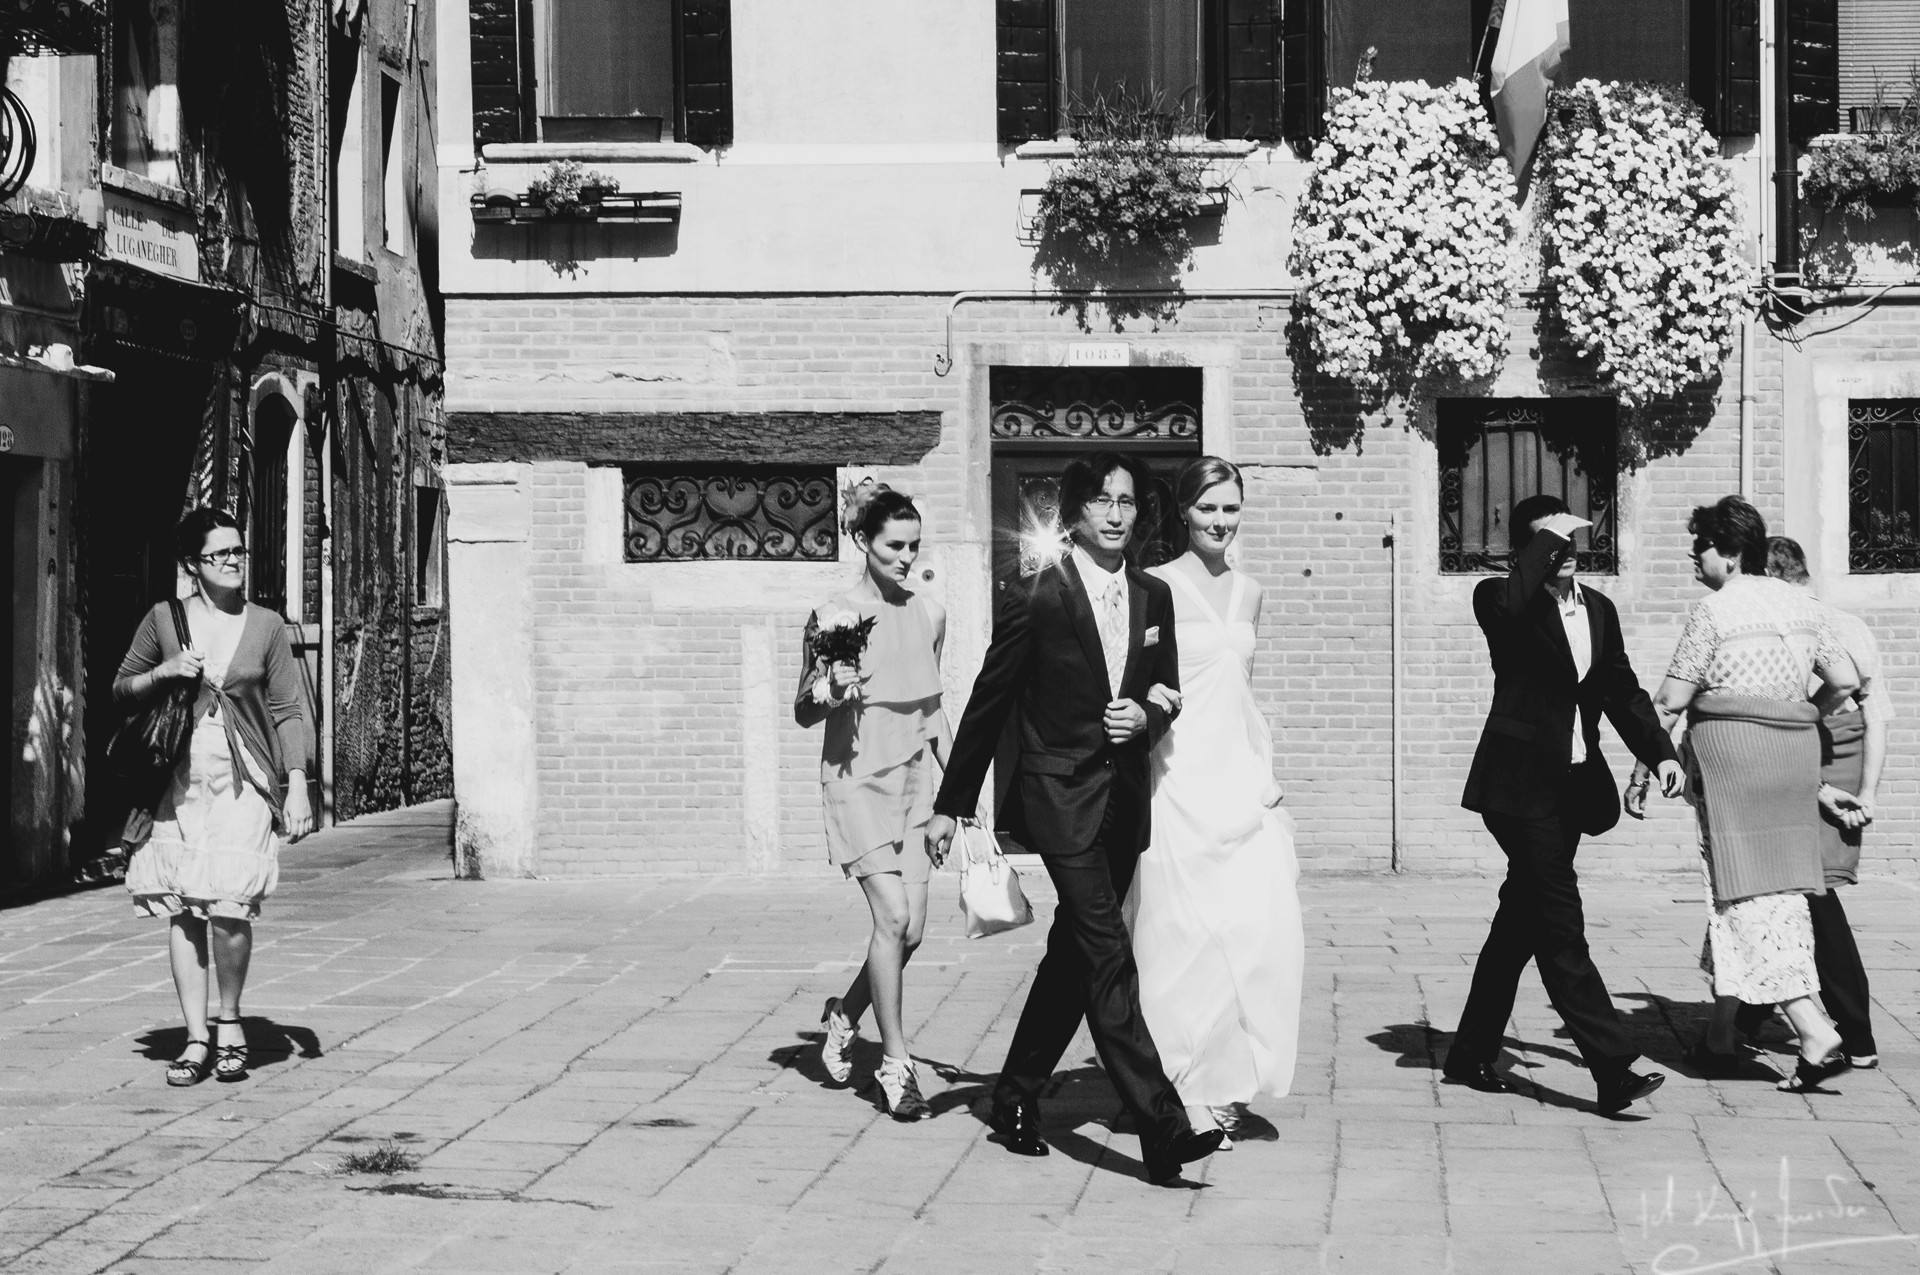 Ślub w wenecji 13 Manuela Luiza & Young Seon Song